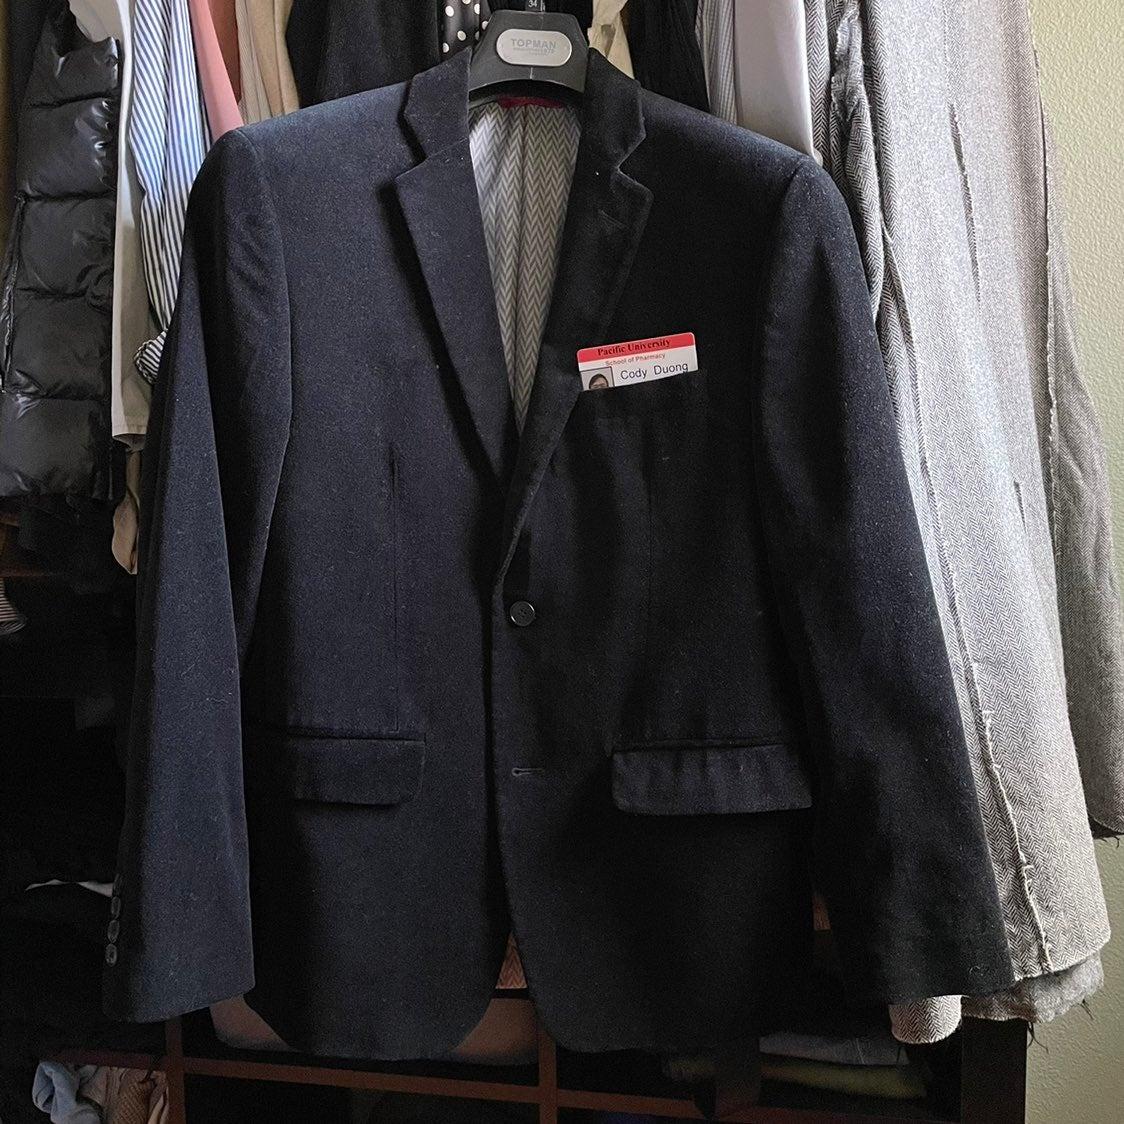 Alfani macy's Blazer velvet black jacket